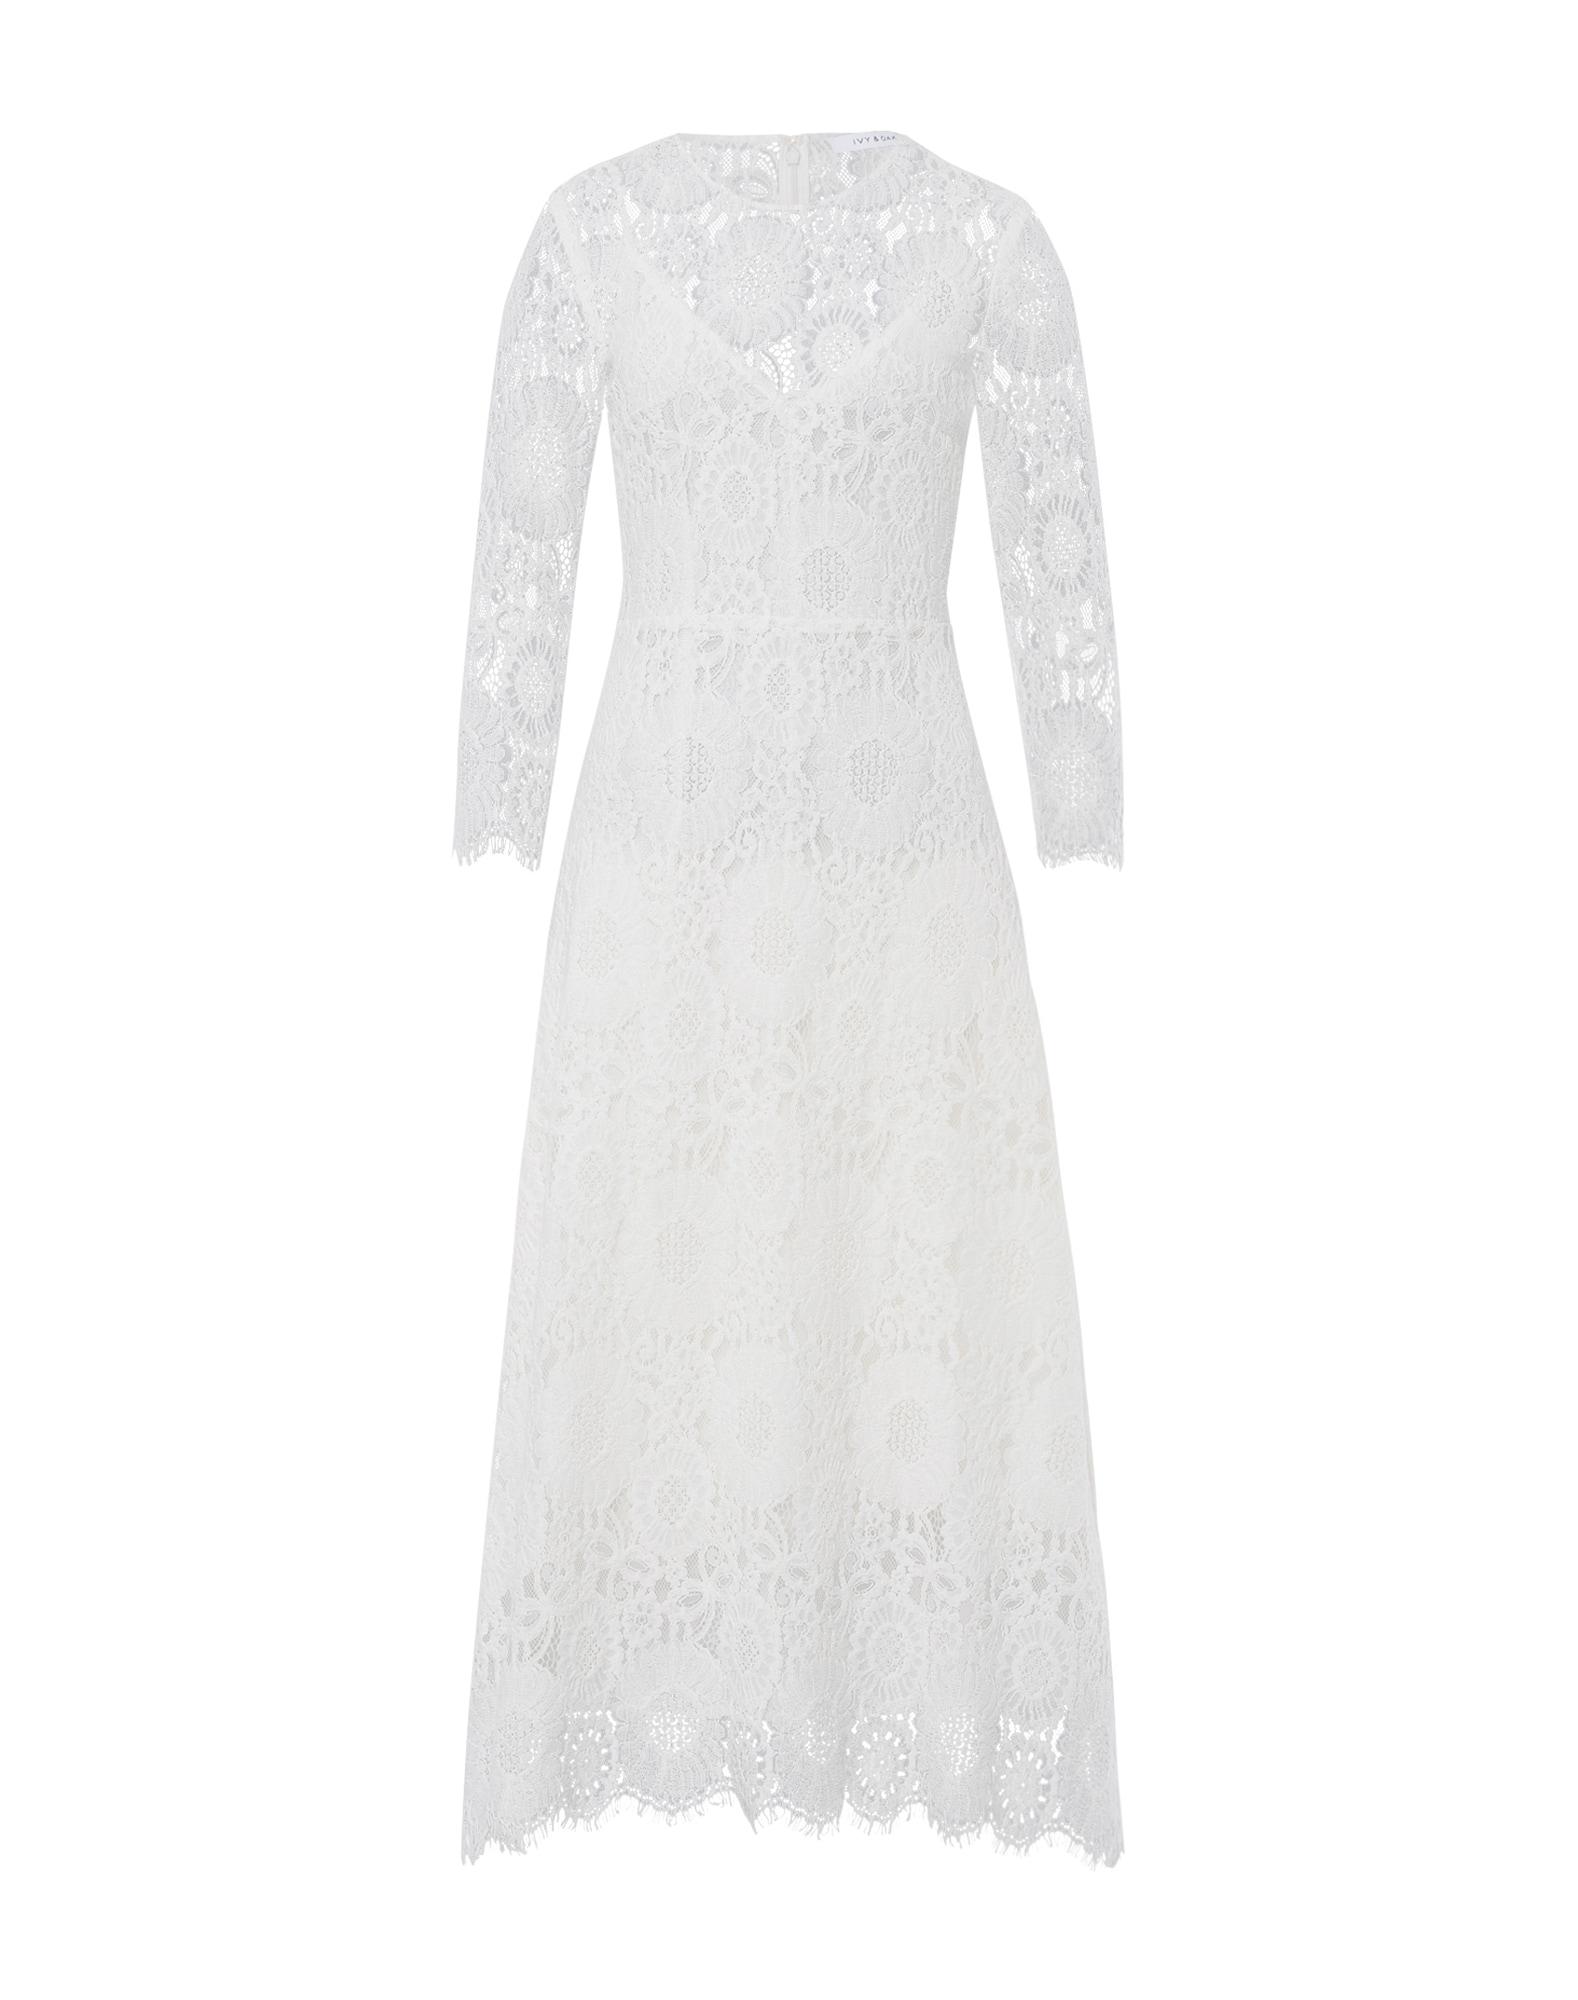 Kleid Ankle Length Lace Dress